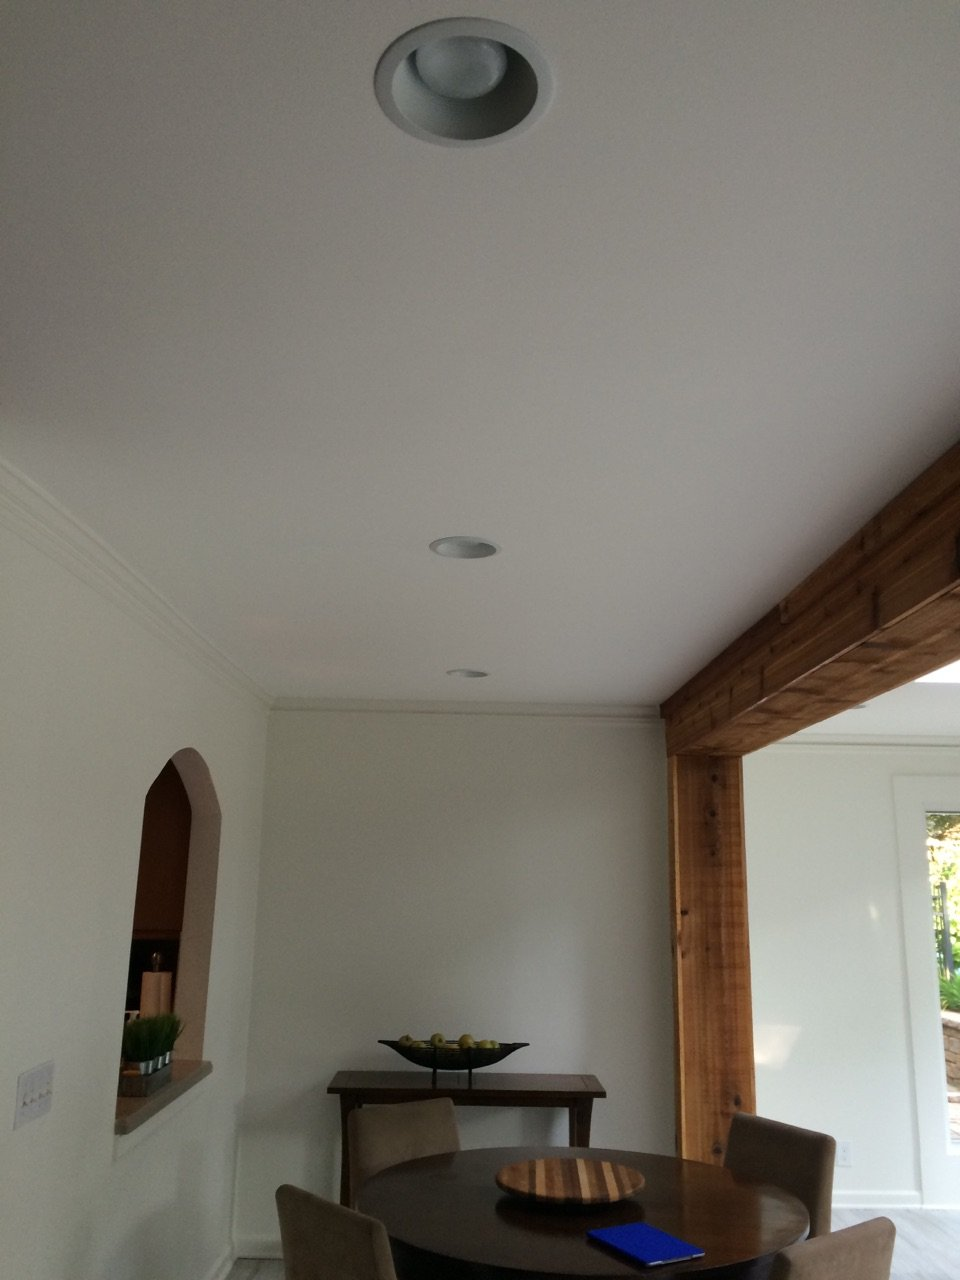 Recessed & Can Lighting Installation Services In Alpharetta & Atlanta